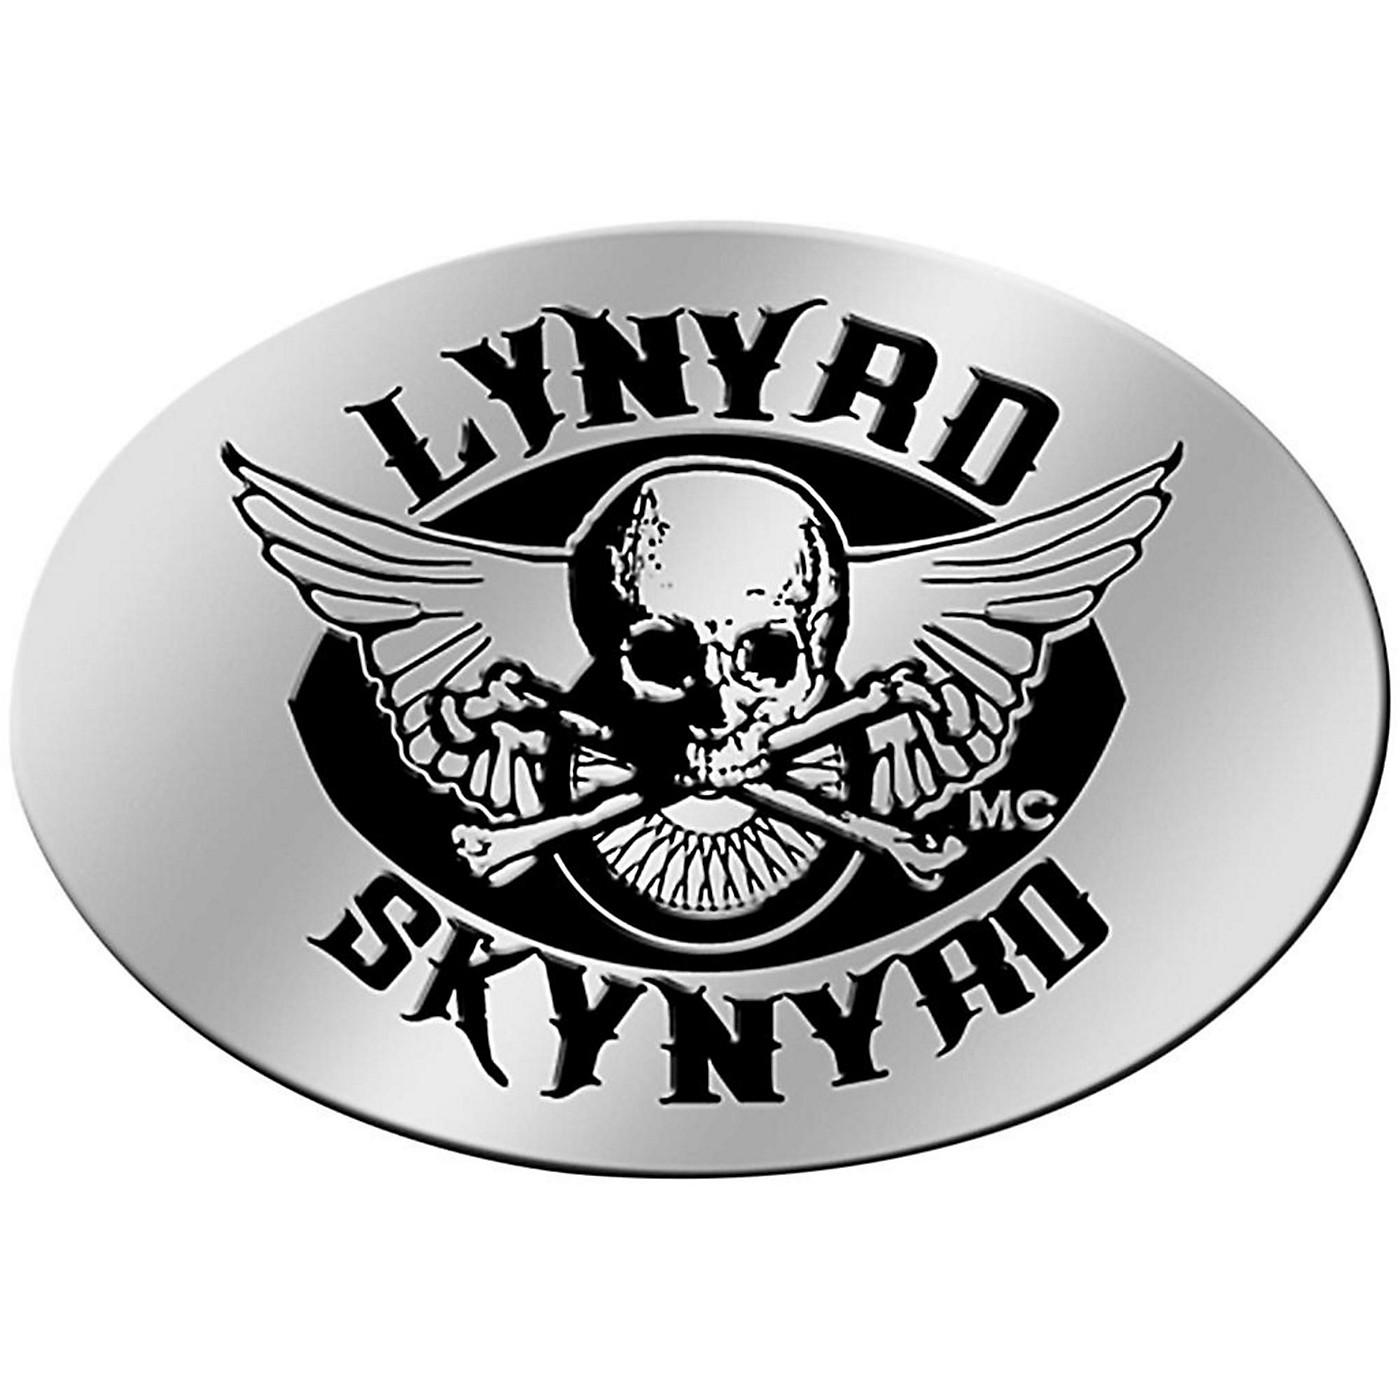 C&D Visionary Lynyrd Skynyrd Heavy Metal Sticker thumbnail